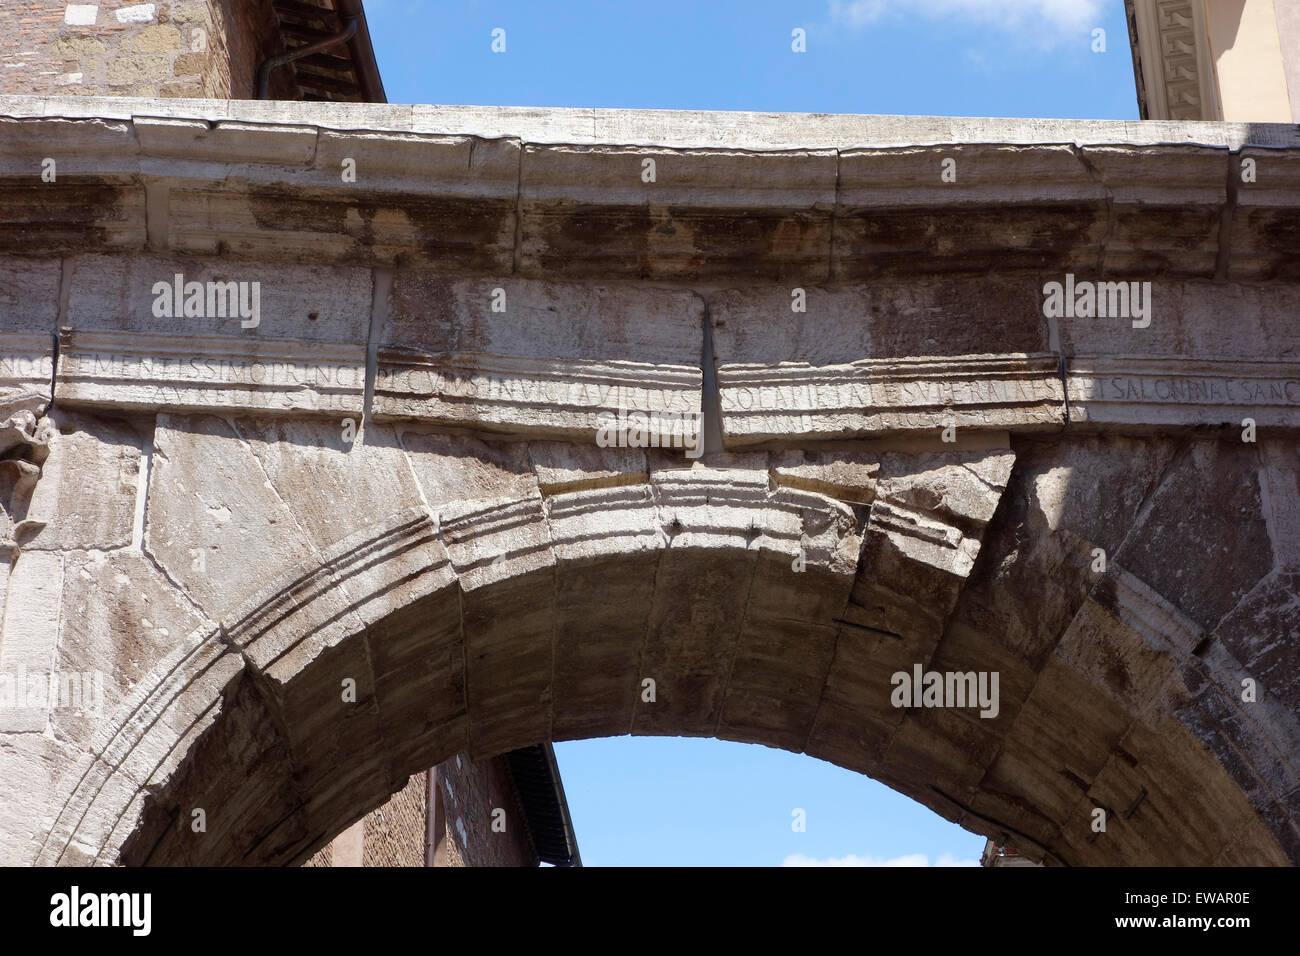 Triumphal Arch of Gallienus Rome Italy Stock Photo